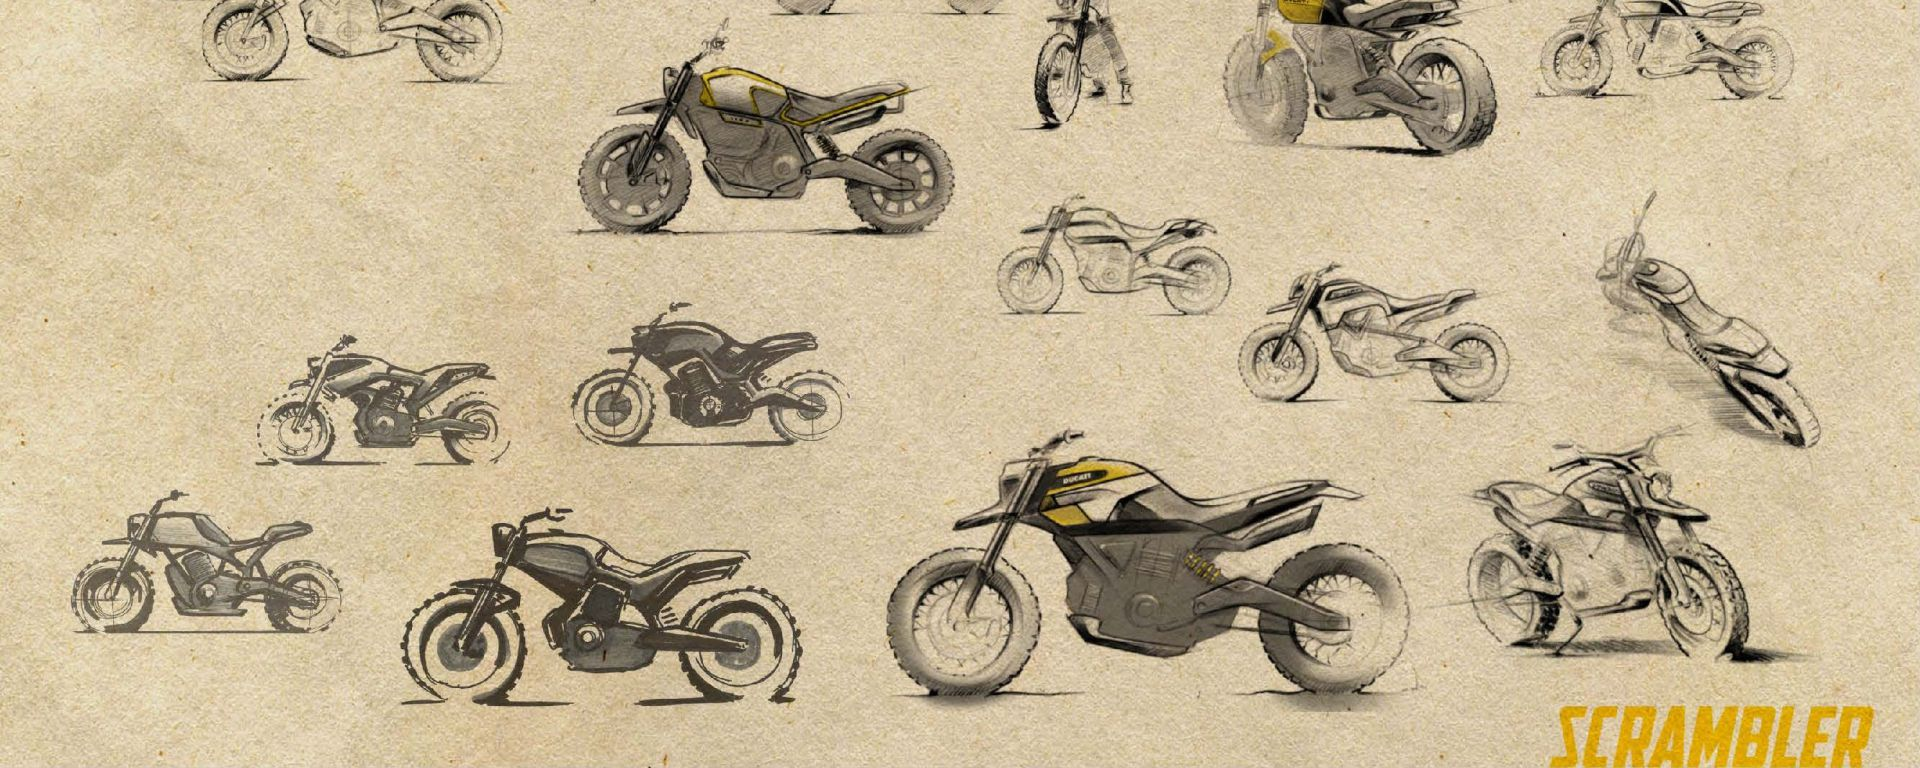 Ducati: le Scrambler del futuro secondo Peter Harkins